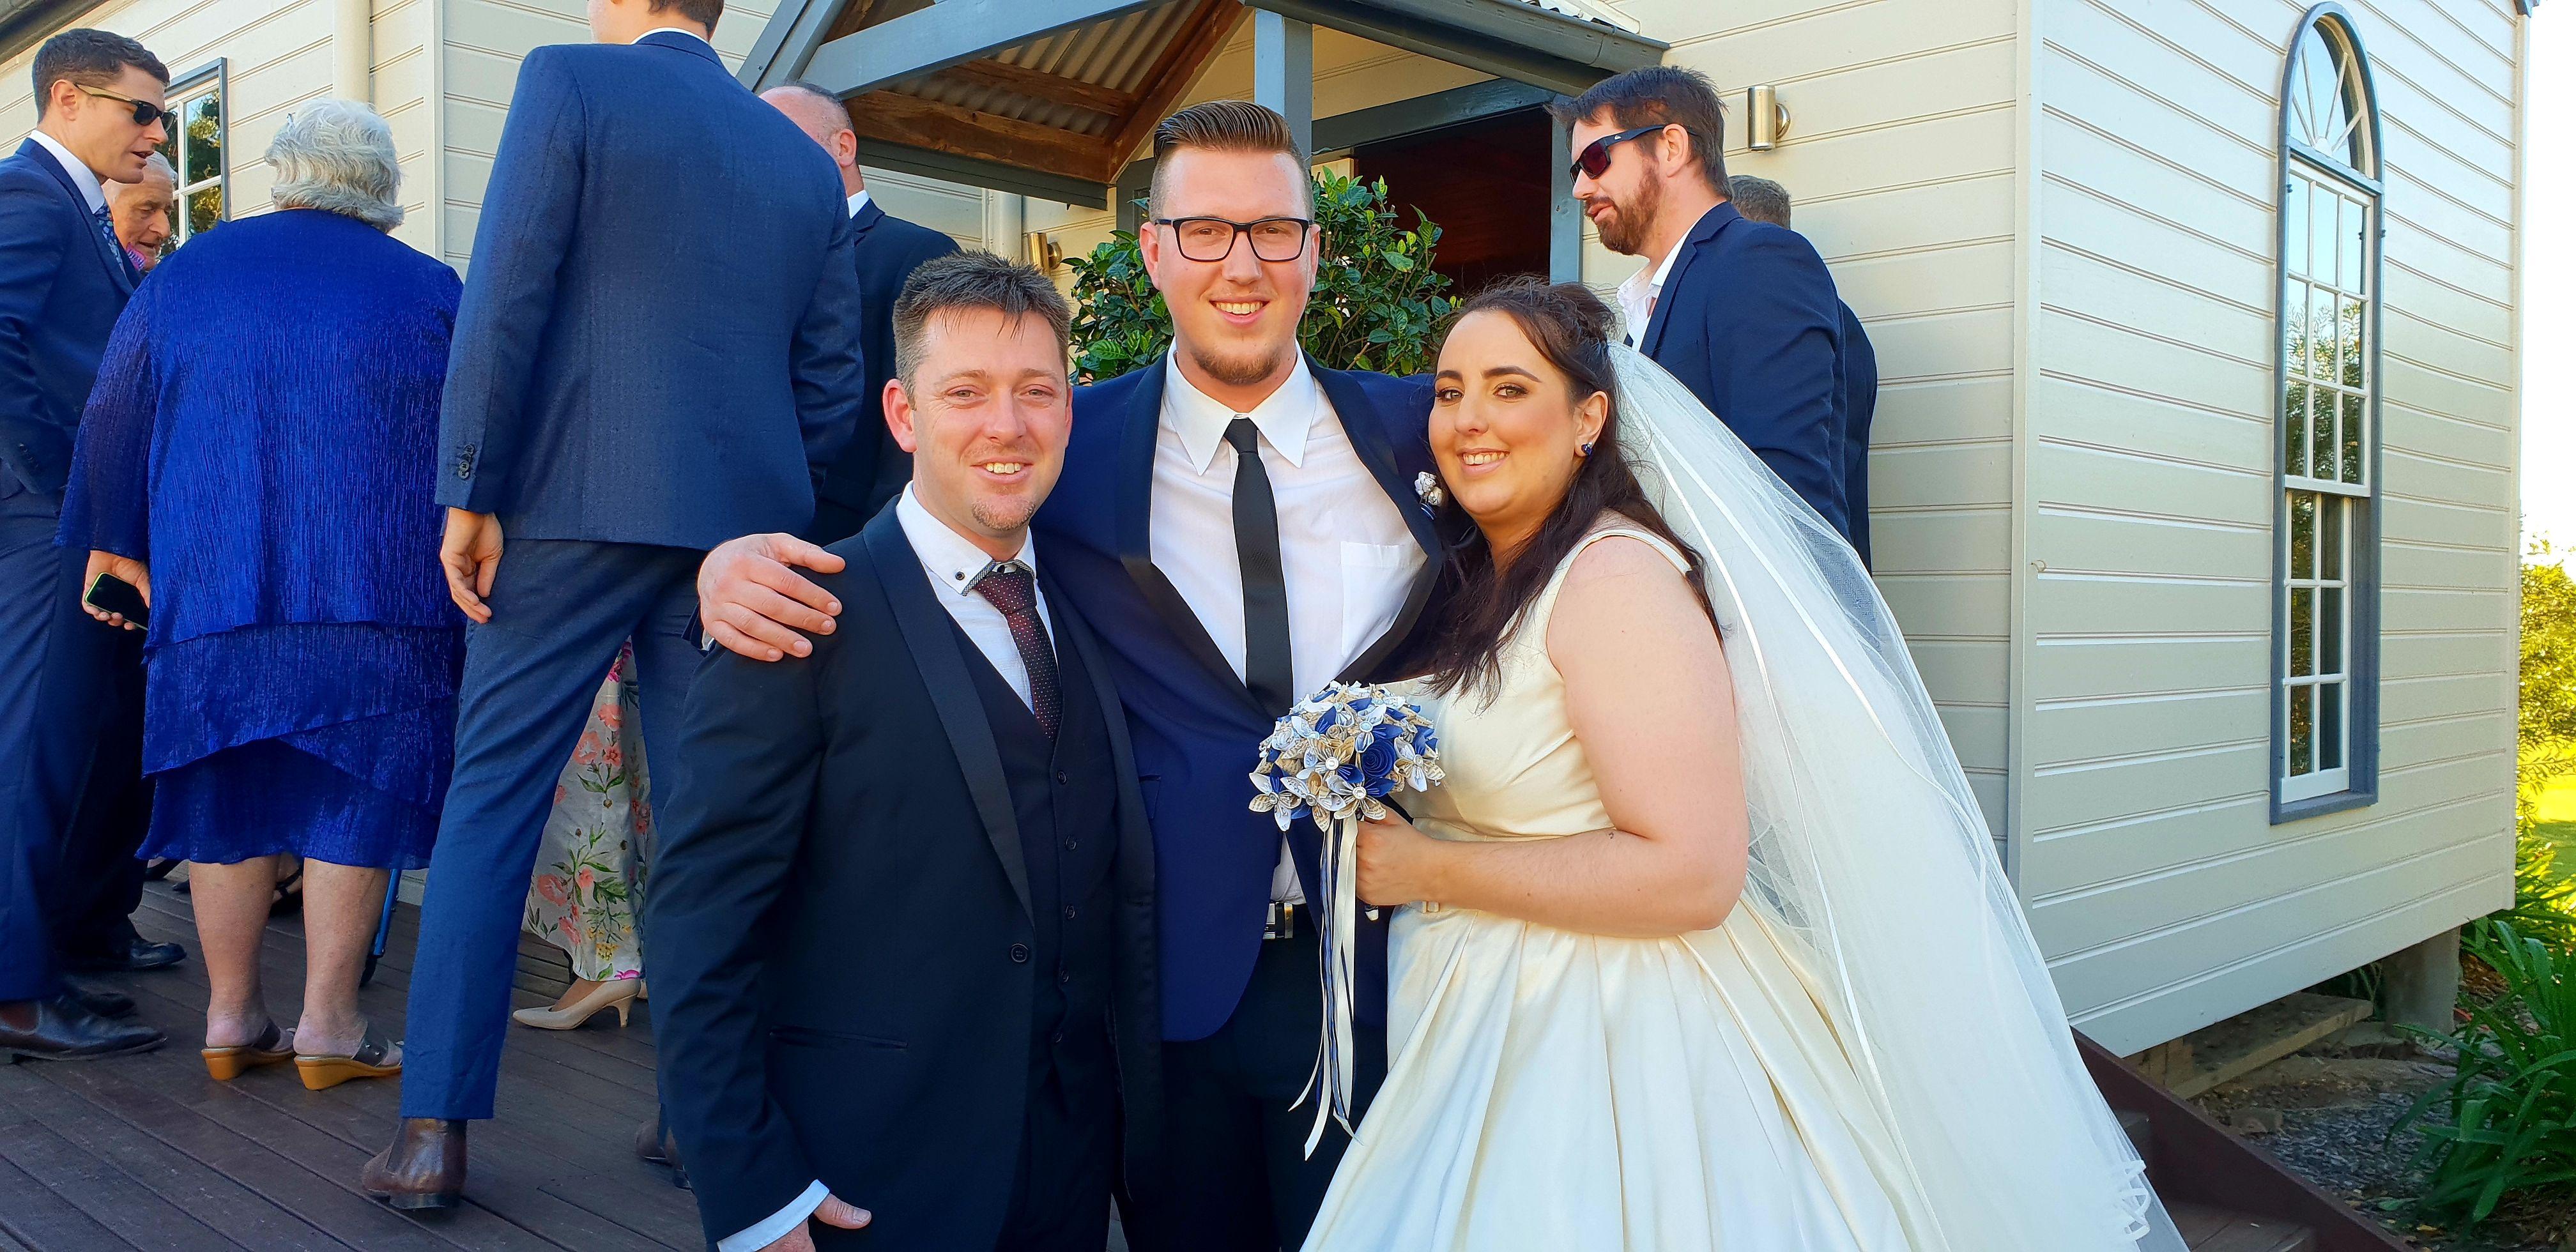 Geeky Ceremony, Geek Wedding, Star Wars Wedding, Themed Ceremony, Fun Celebrant, Sydney Celebrant, Hawkesbury Celebrant